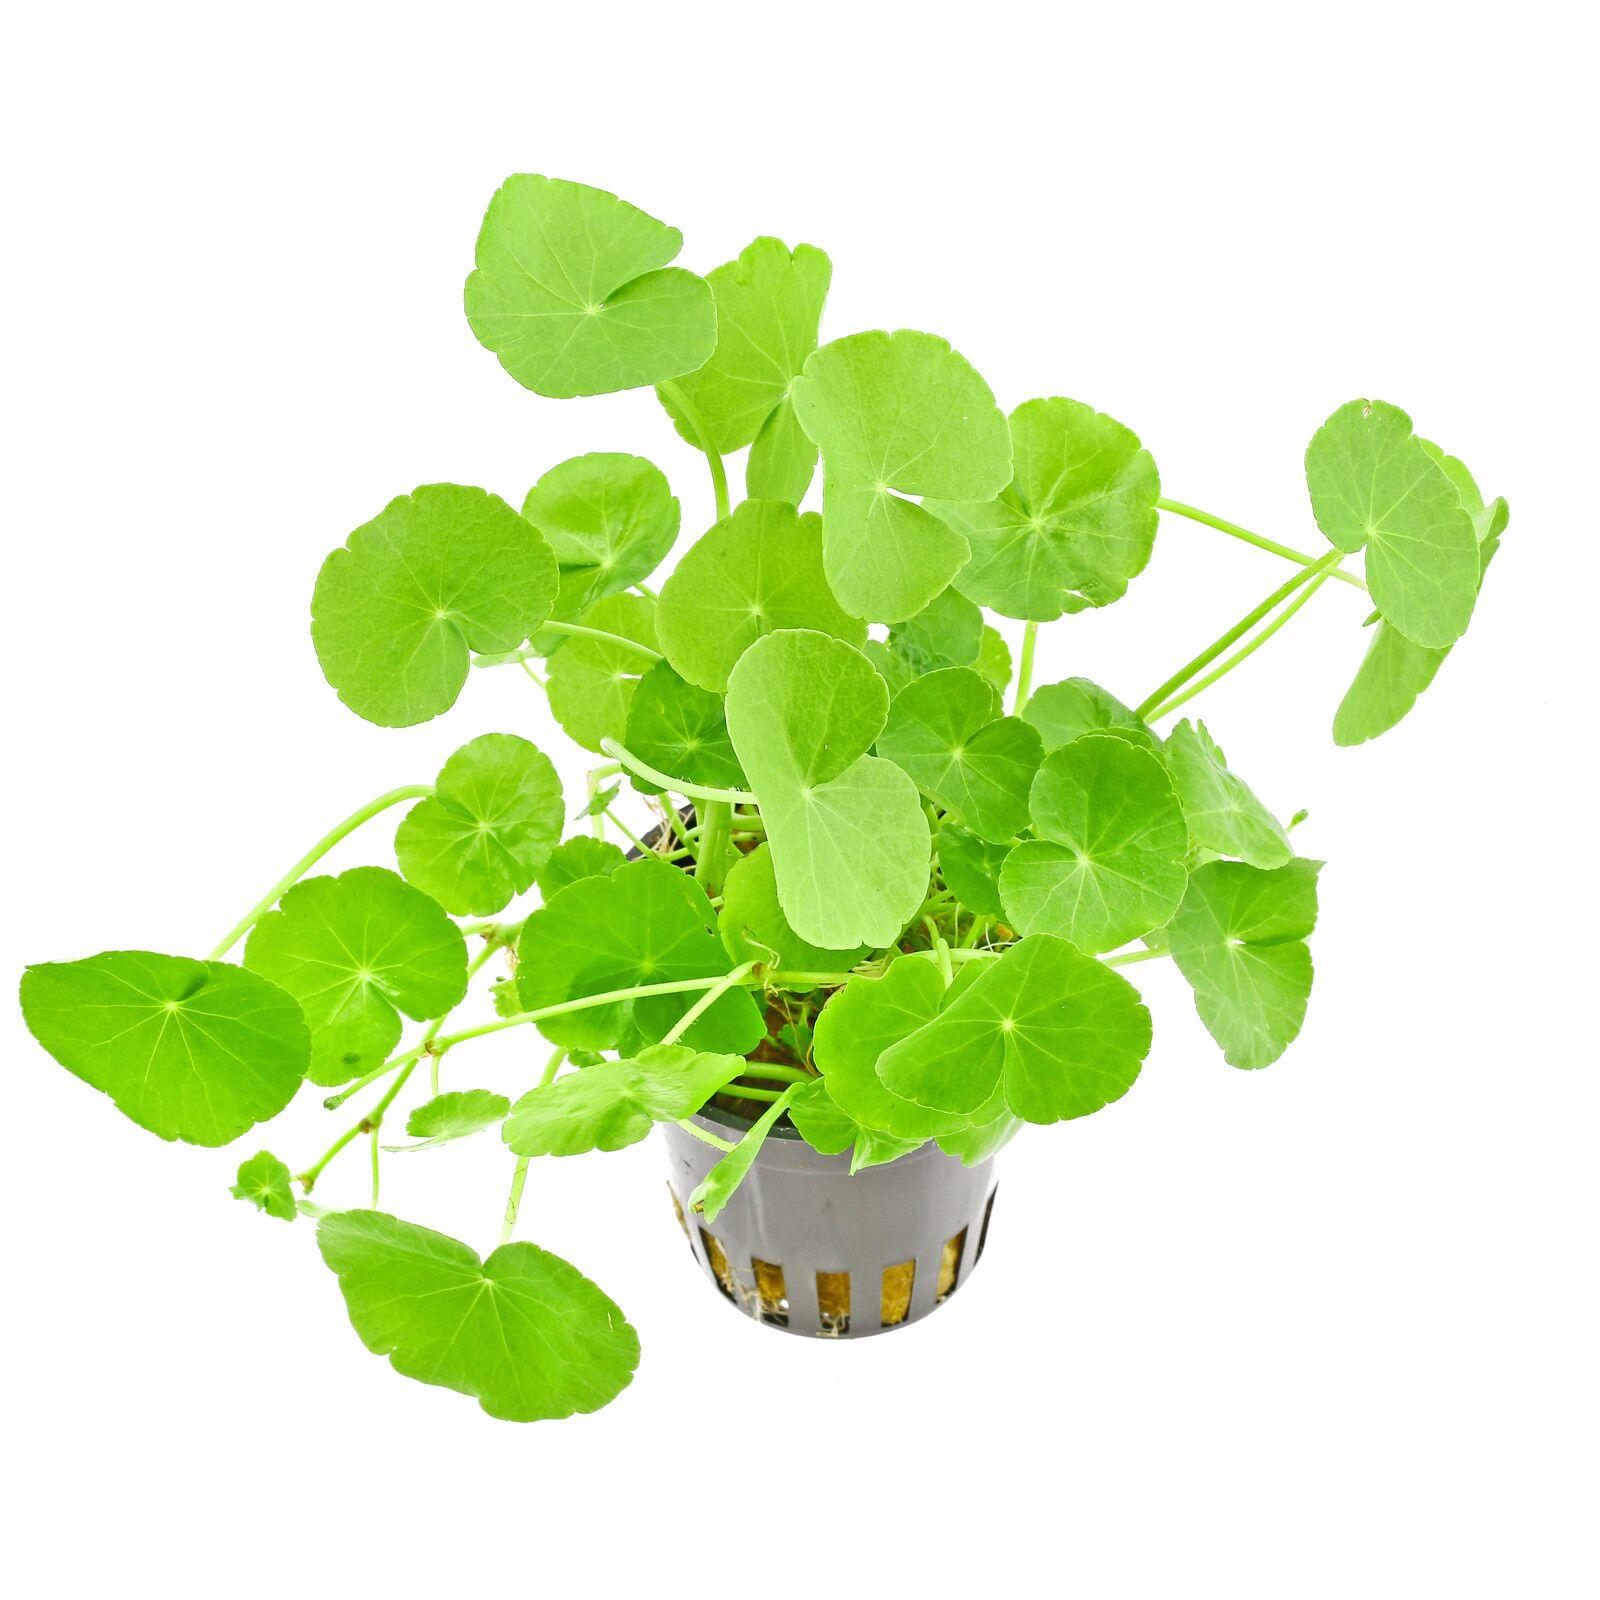 HYDROCOTYLE LEUCOCHEPALA 10 STEMS PLANT AQUARIUM